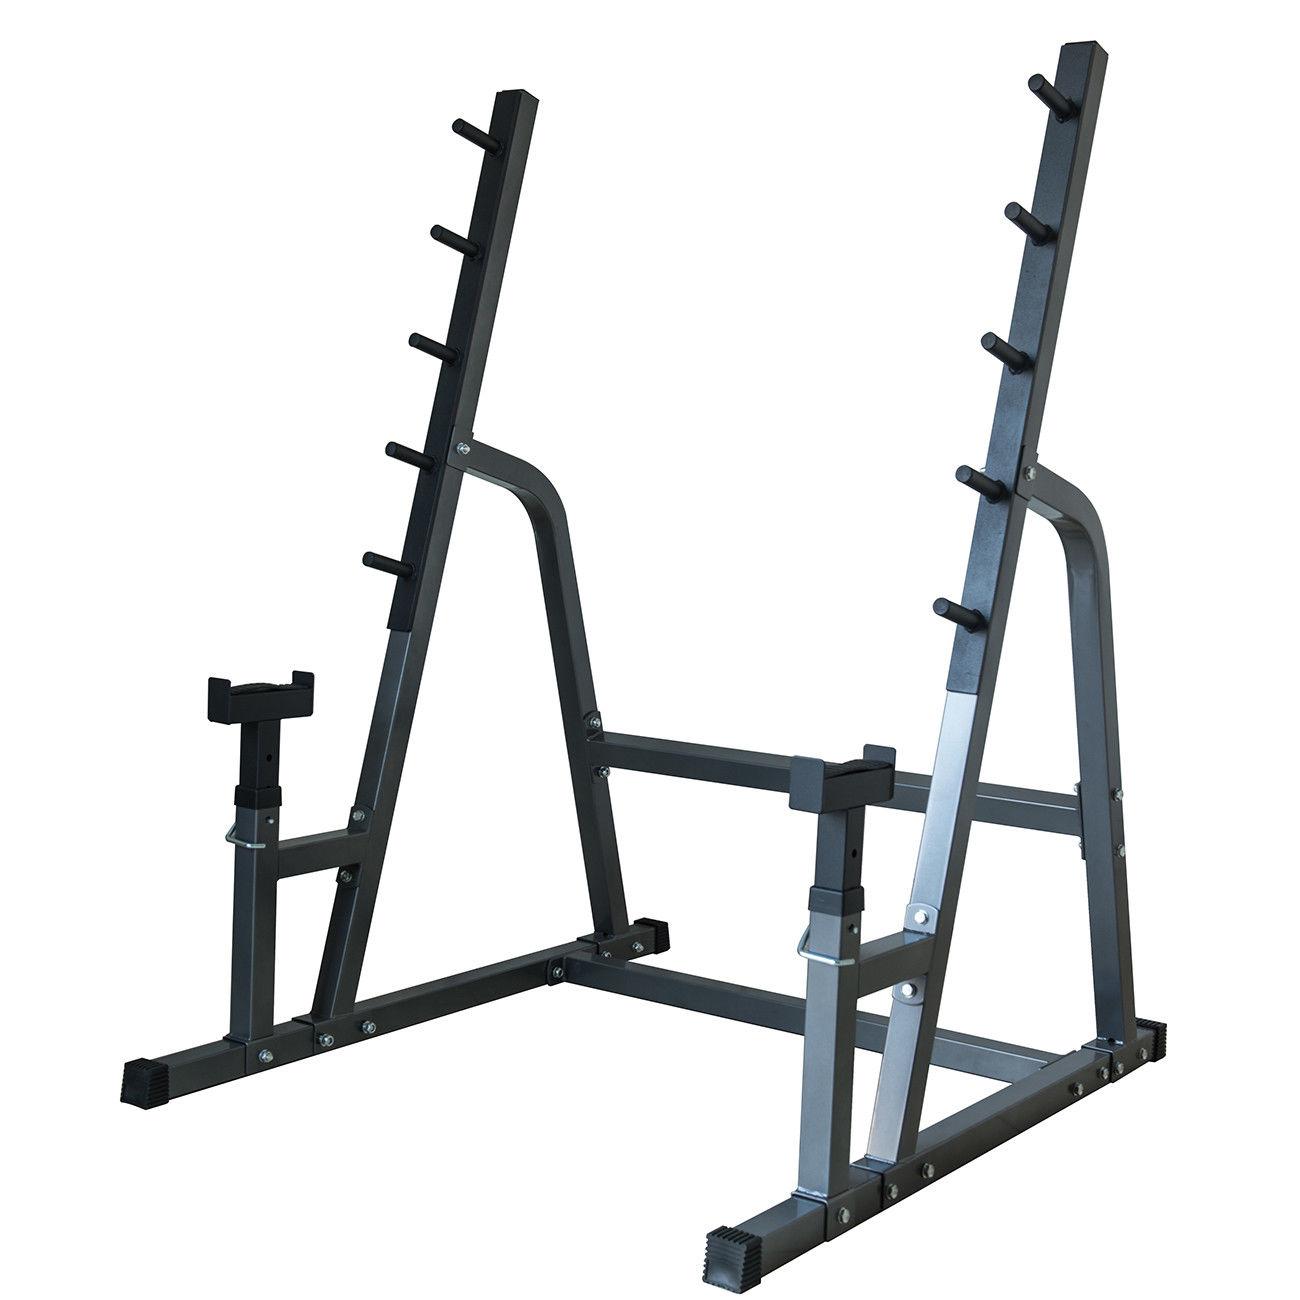 Deluxe Squat Bench Combo Rack Fitness Exercise Equipment